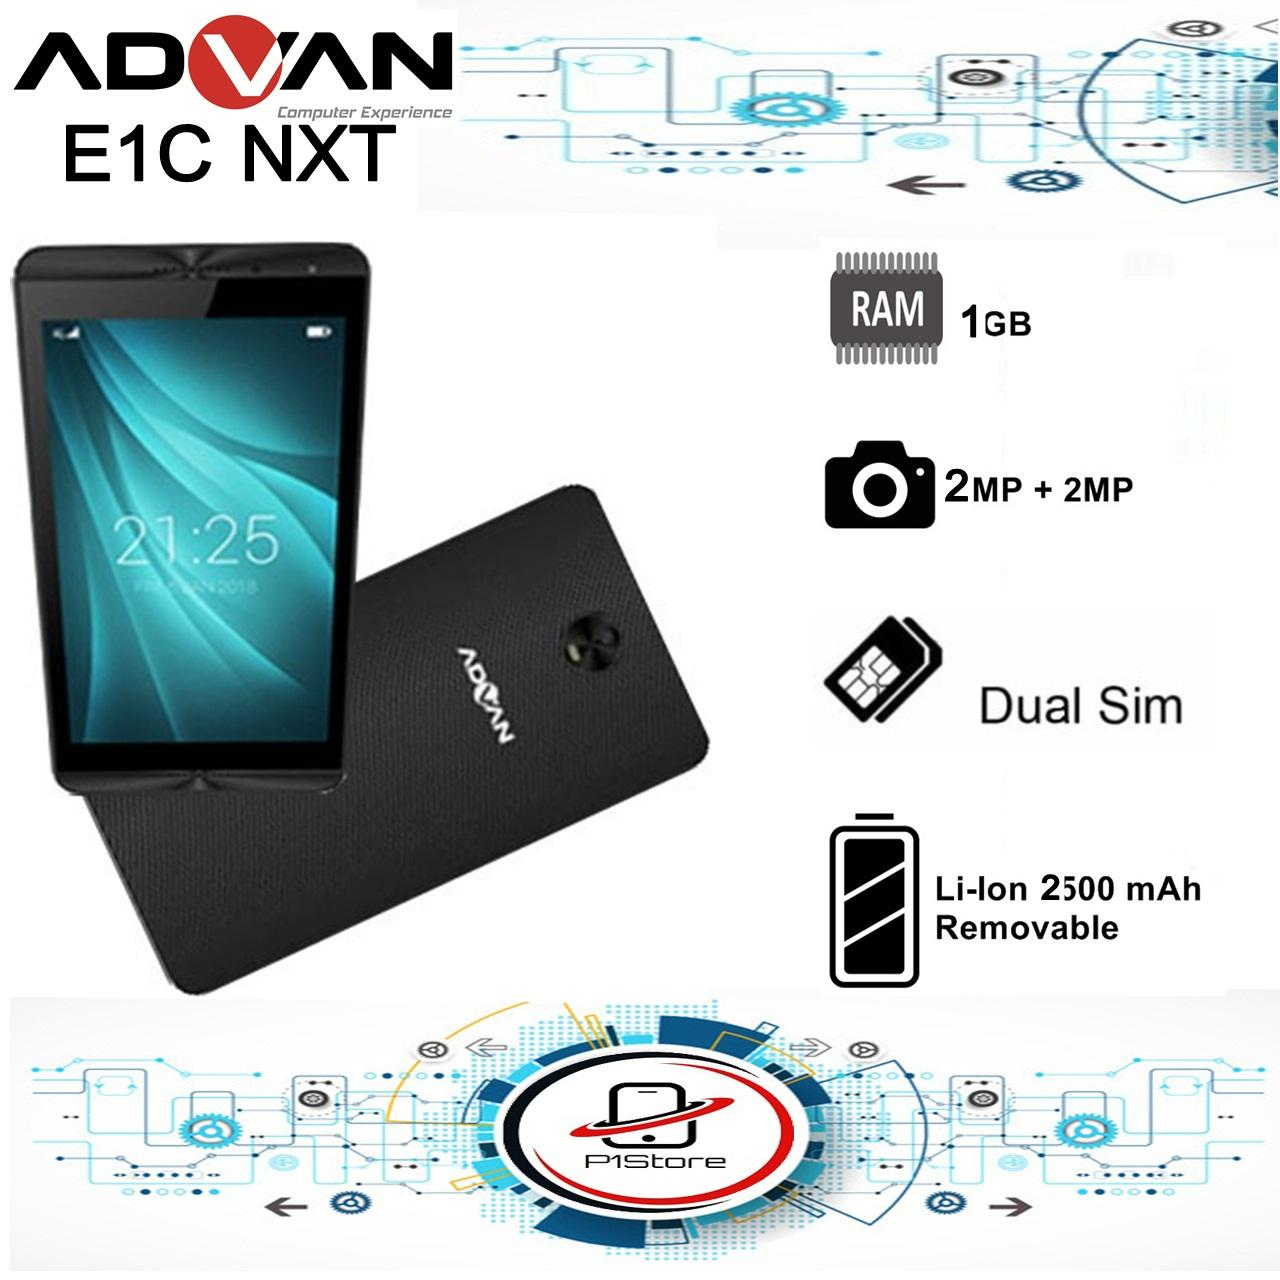 Advan E1C NXT Tablet Sound Movie Ram 1GB Rom 8GB - Garansi Resmi